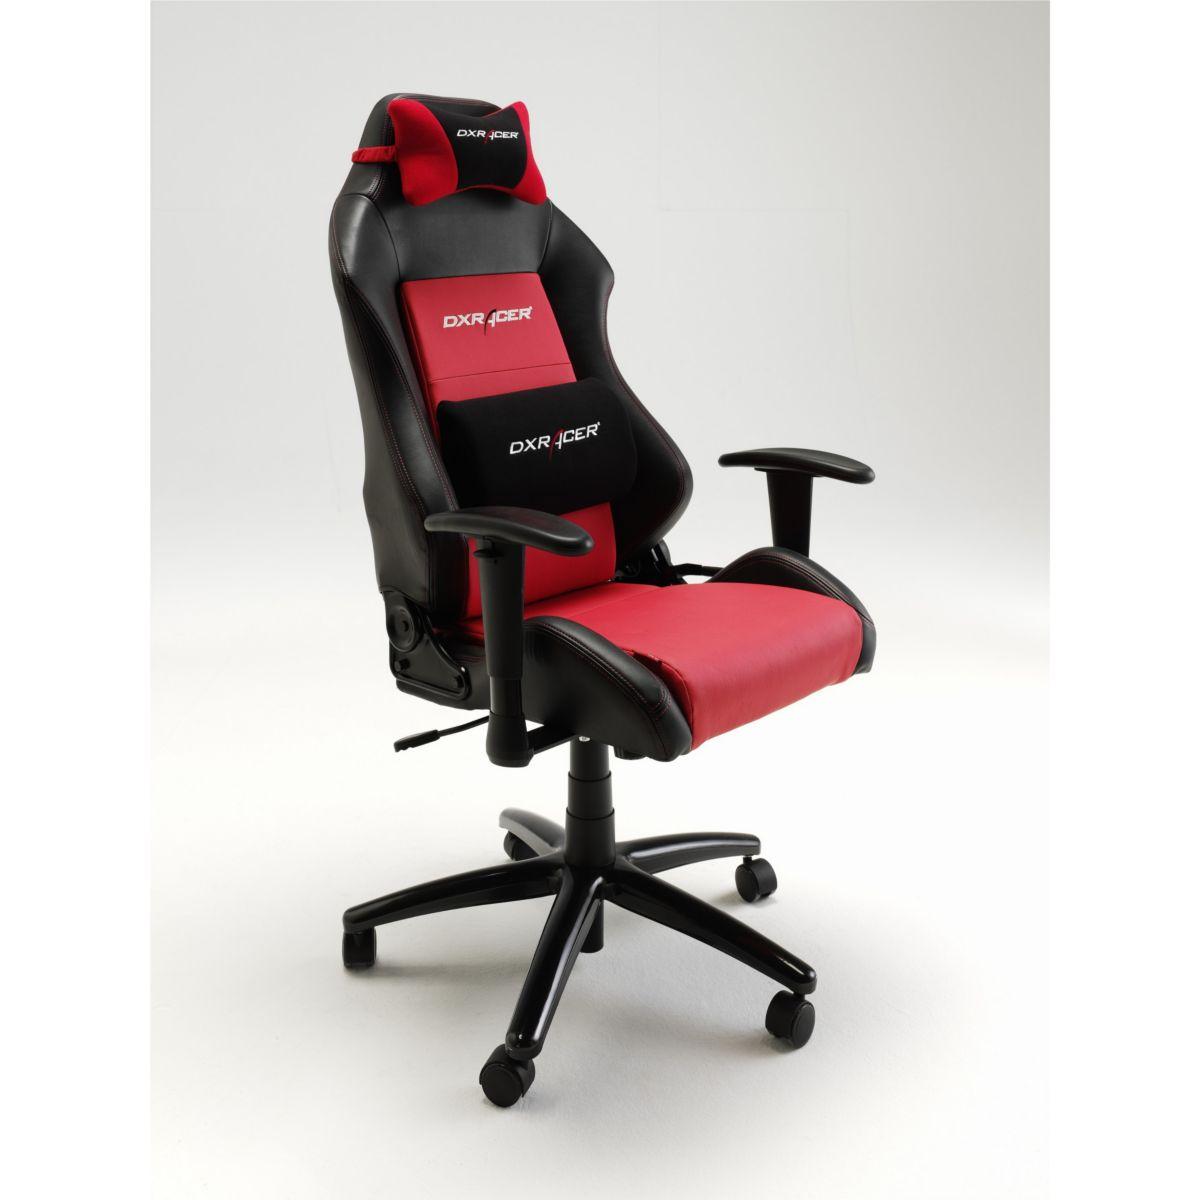 DX Racer Bürostuhl Computerstuhl Drehstuhl Gamer Chair Kunstleder schwarz/ rot jetztbilligerkaufen